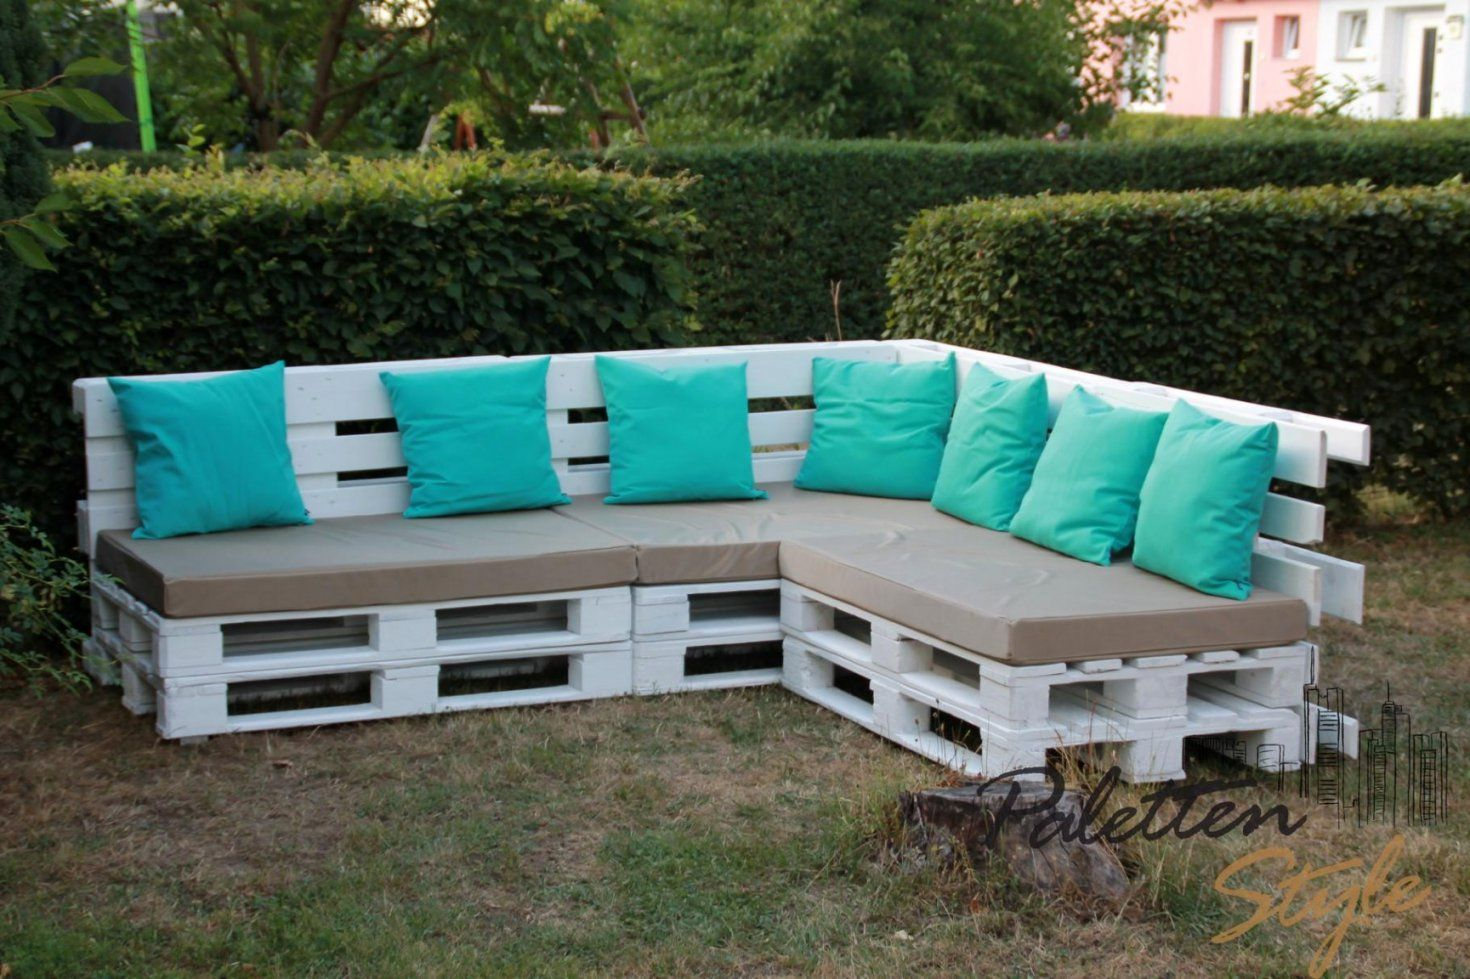 Elegant Emejing Lounge Ecke Garten Selber Bauen Gallery Rellik Für von Lounge Ecke Selber Bauen Photo